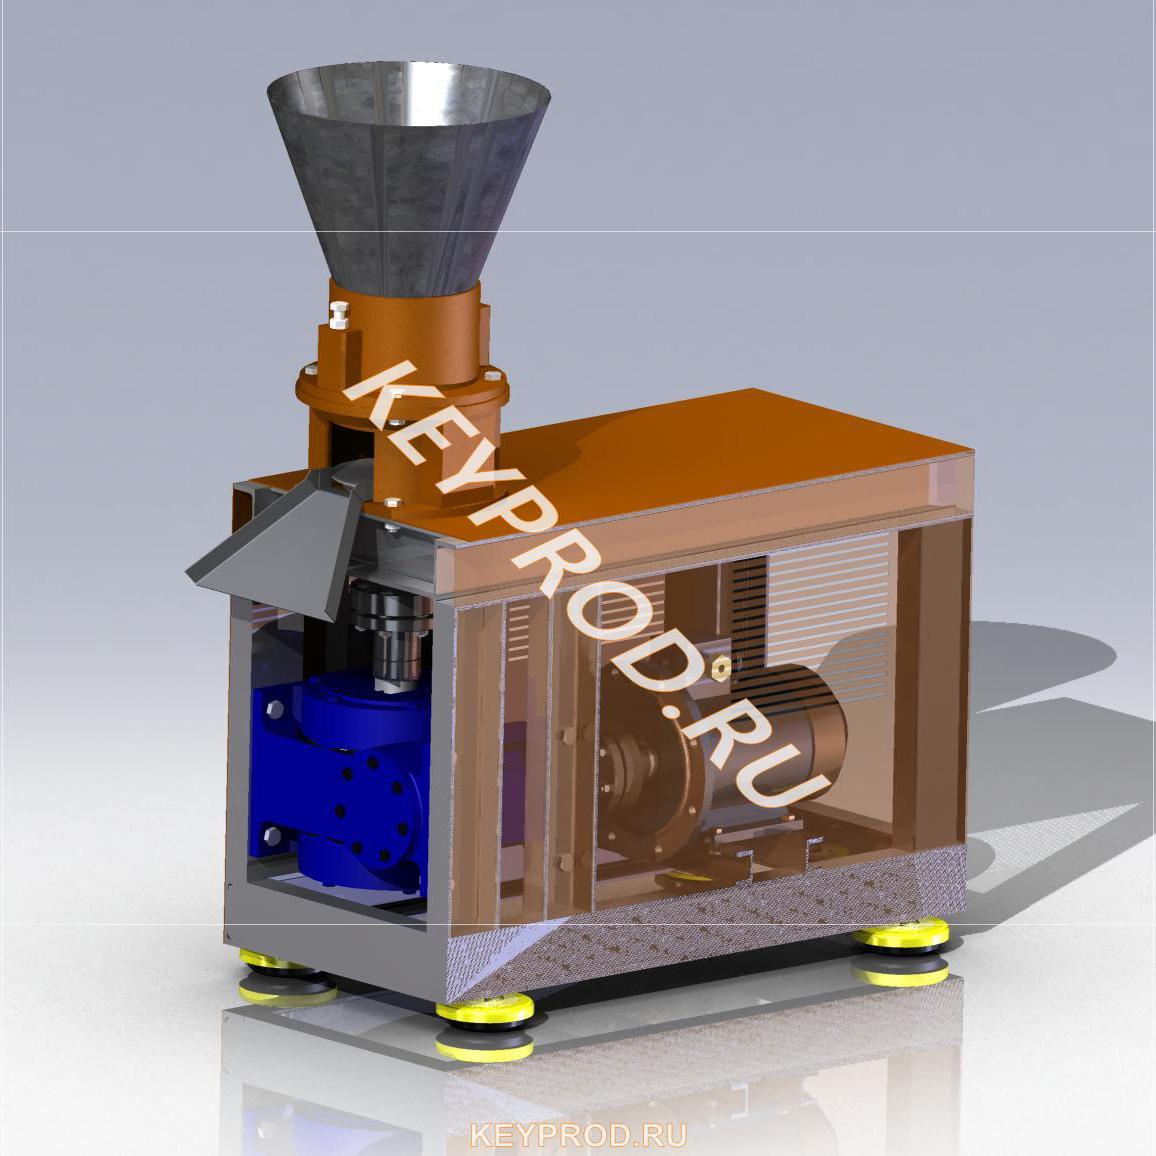 Производство пеллет в домашних условиях из опилок - m